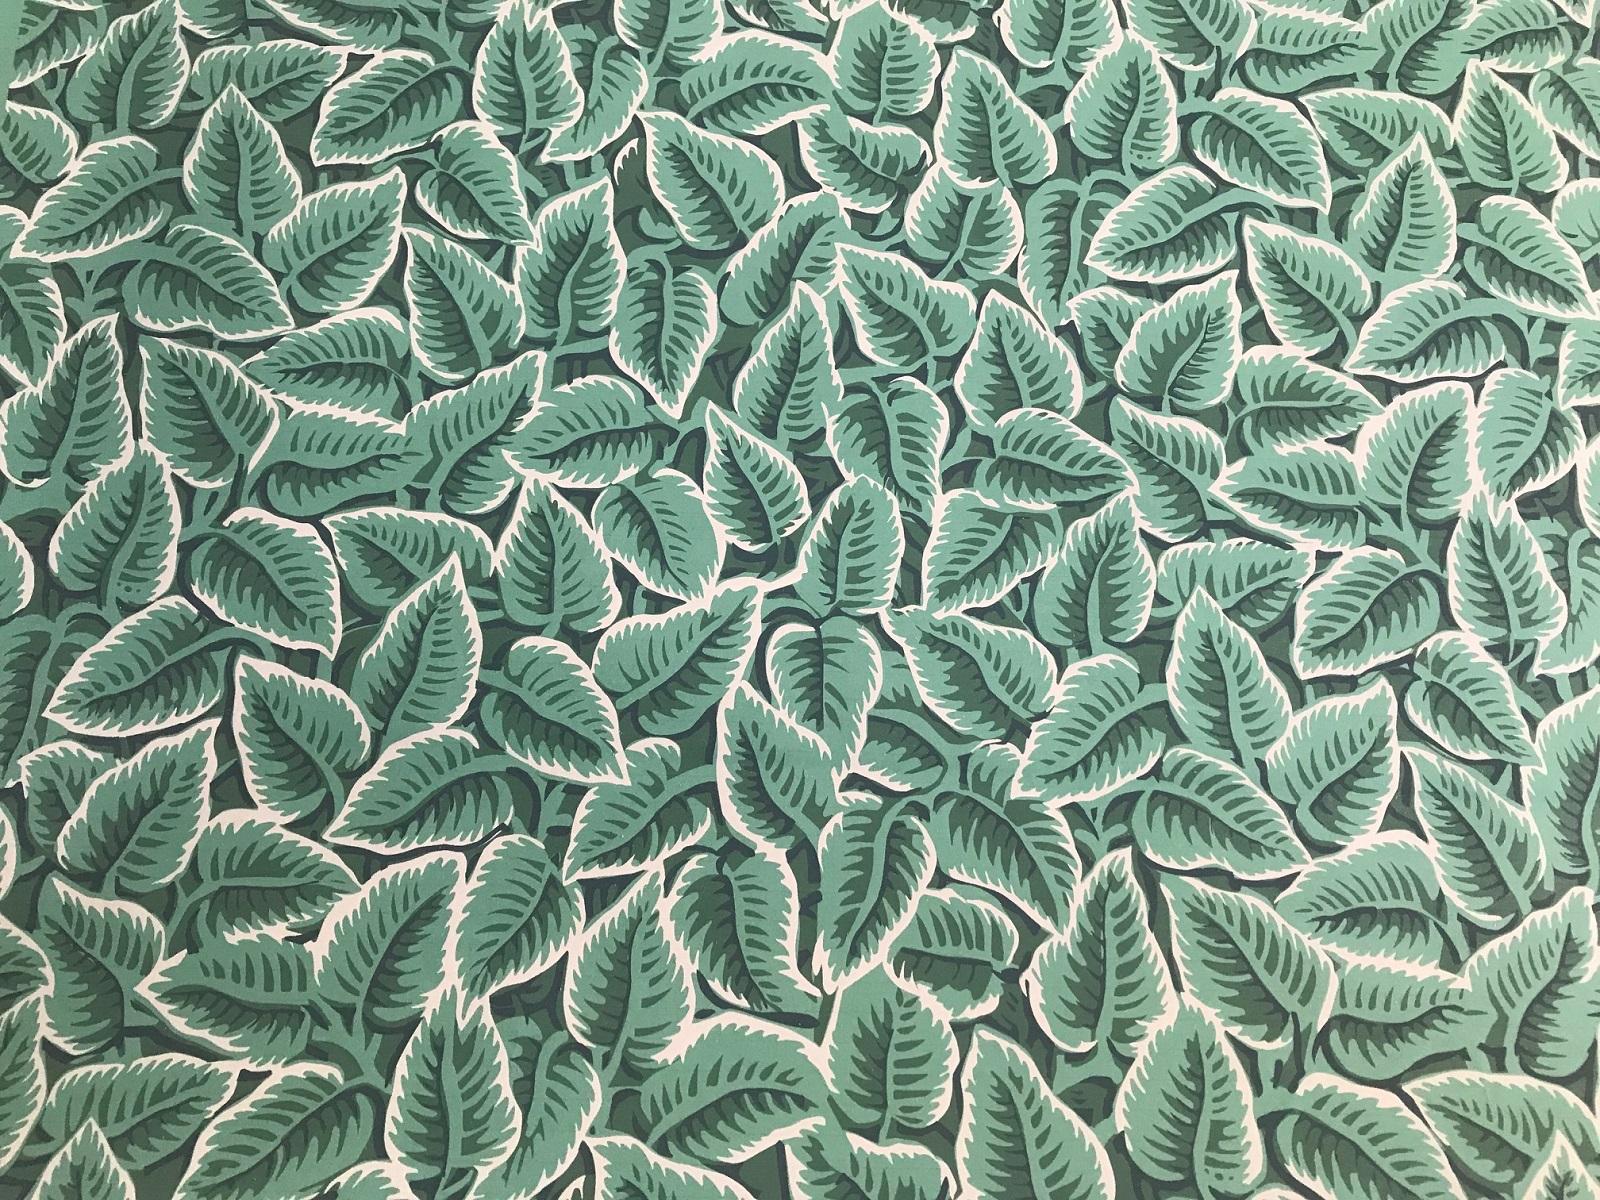 Chawton Leaf wallpaper design